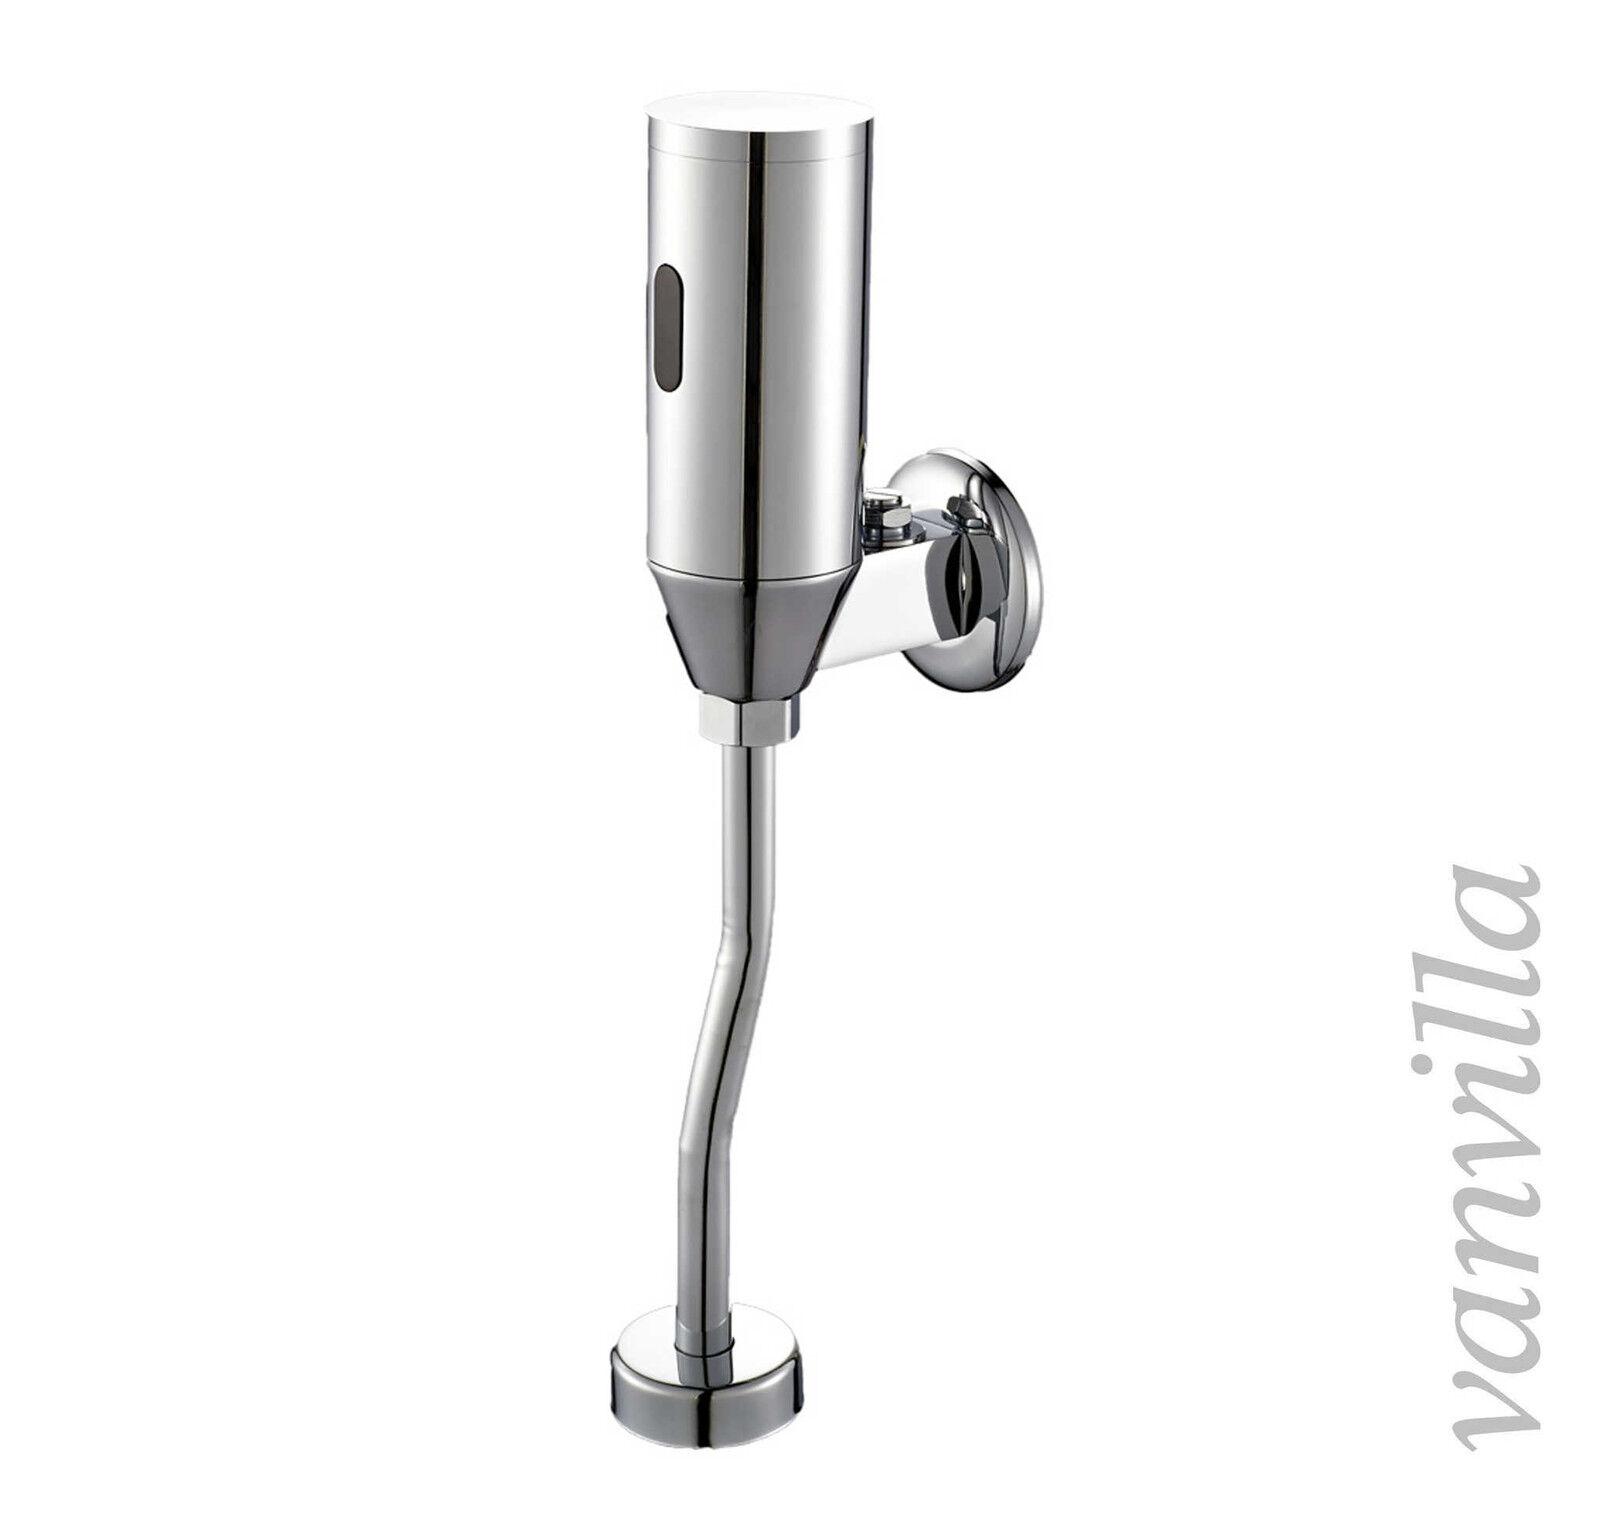 Design Sensor Urinal Armatur Urinalspüler Infrarot A706 Urinal Spüler